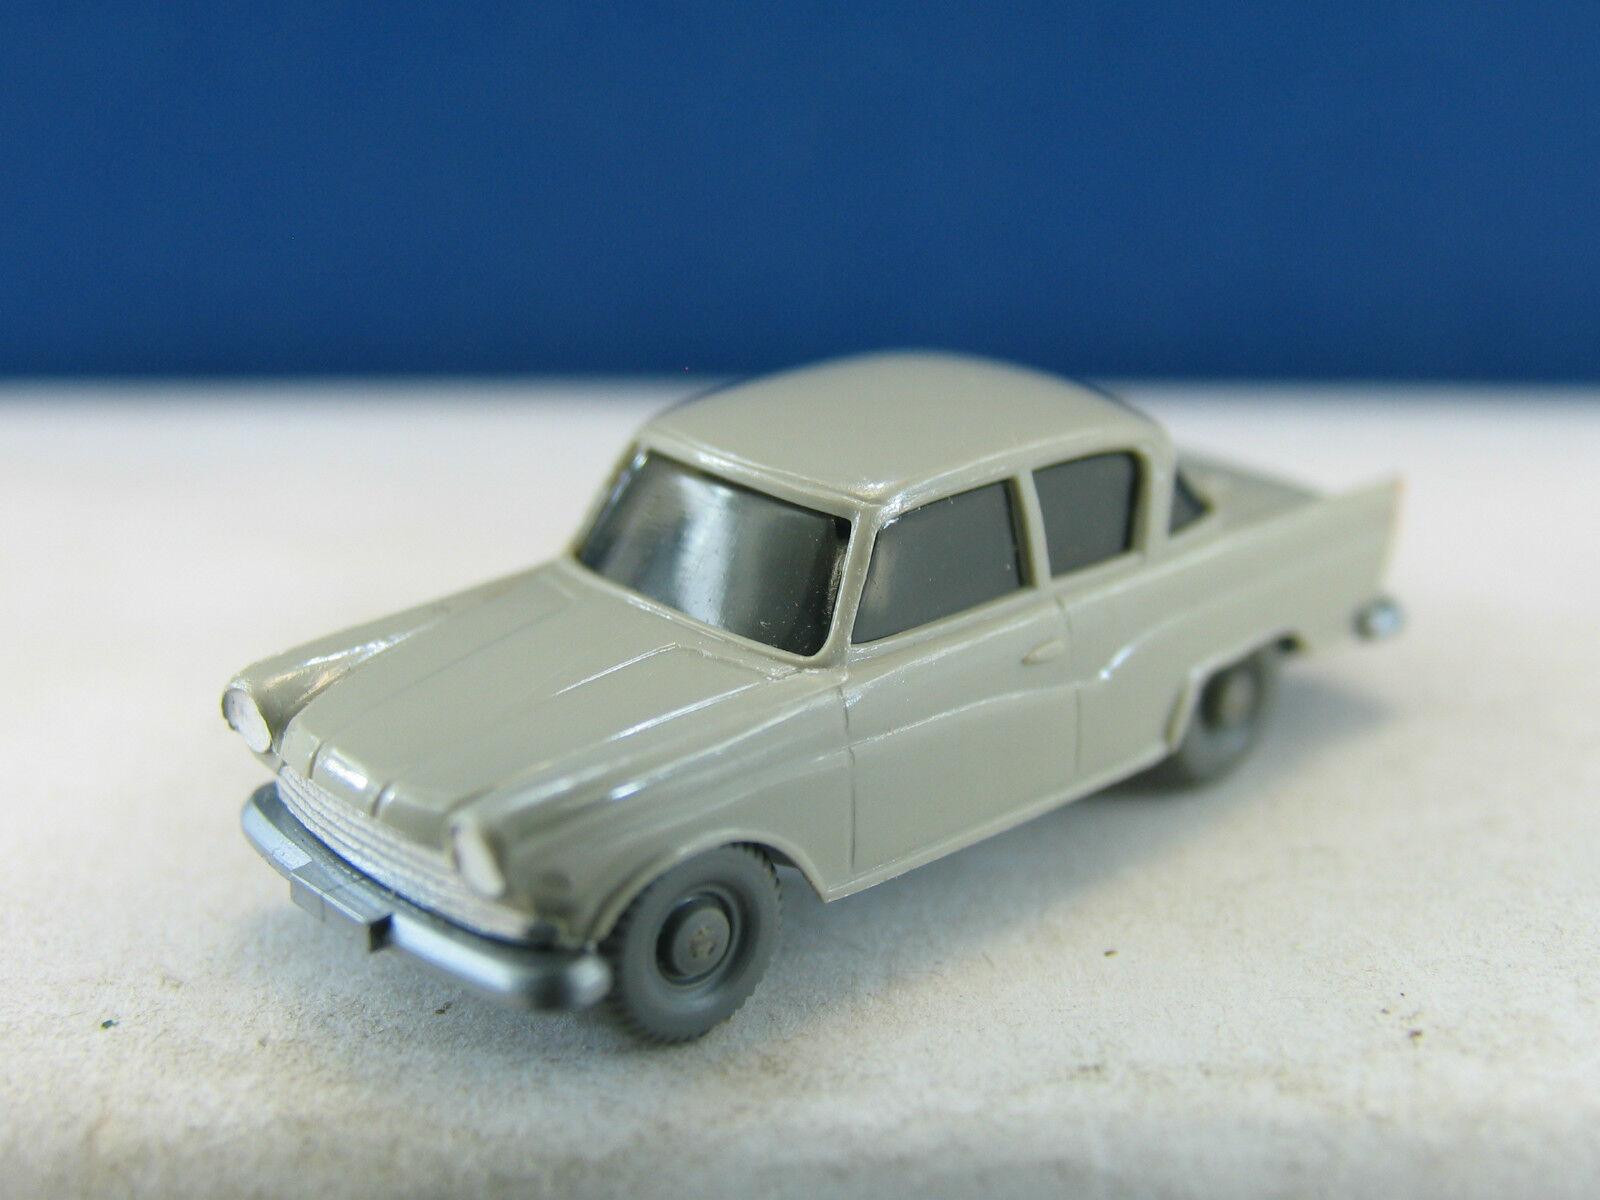 Wiking Cars 180 2 Borgward Arabella x1231